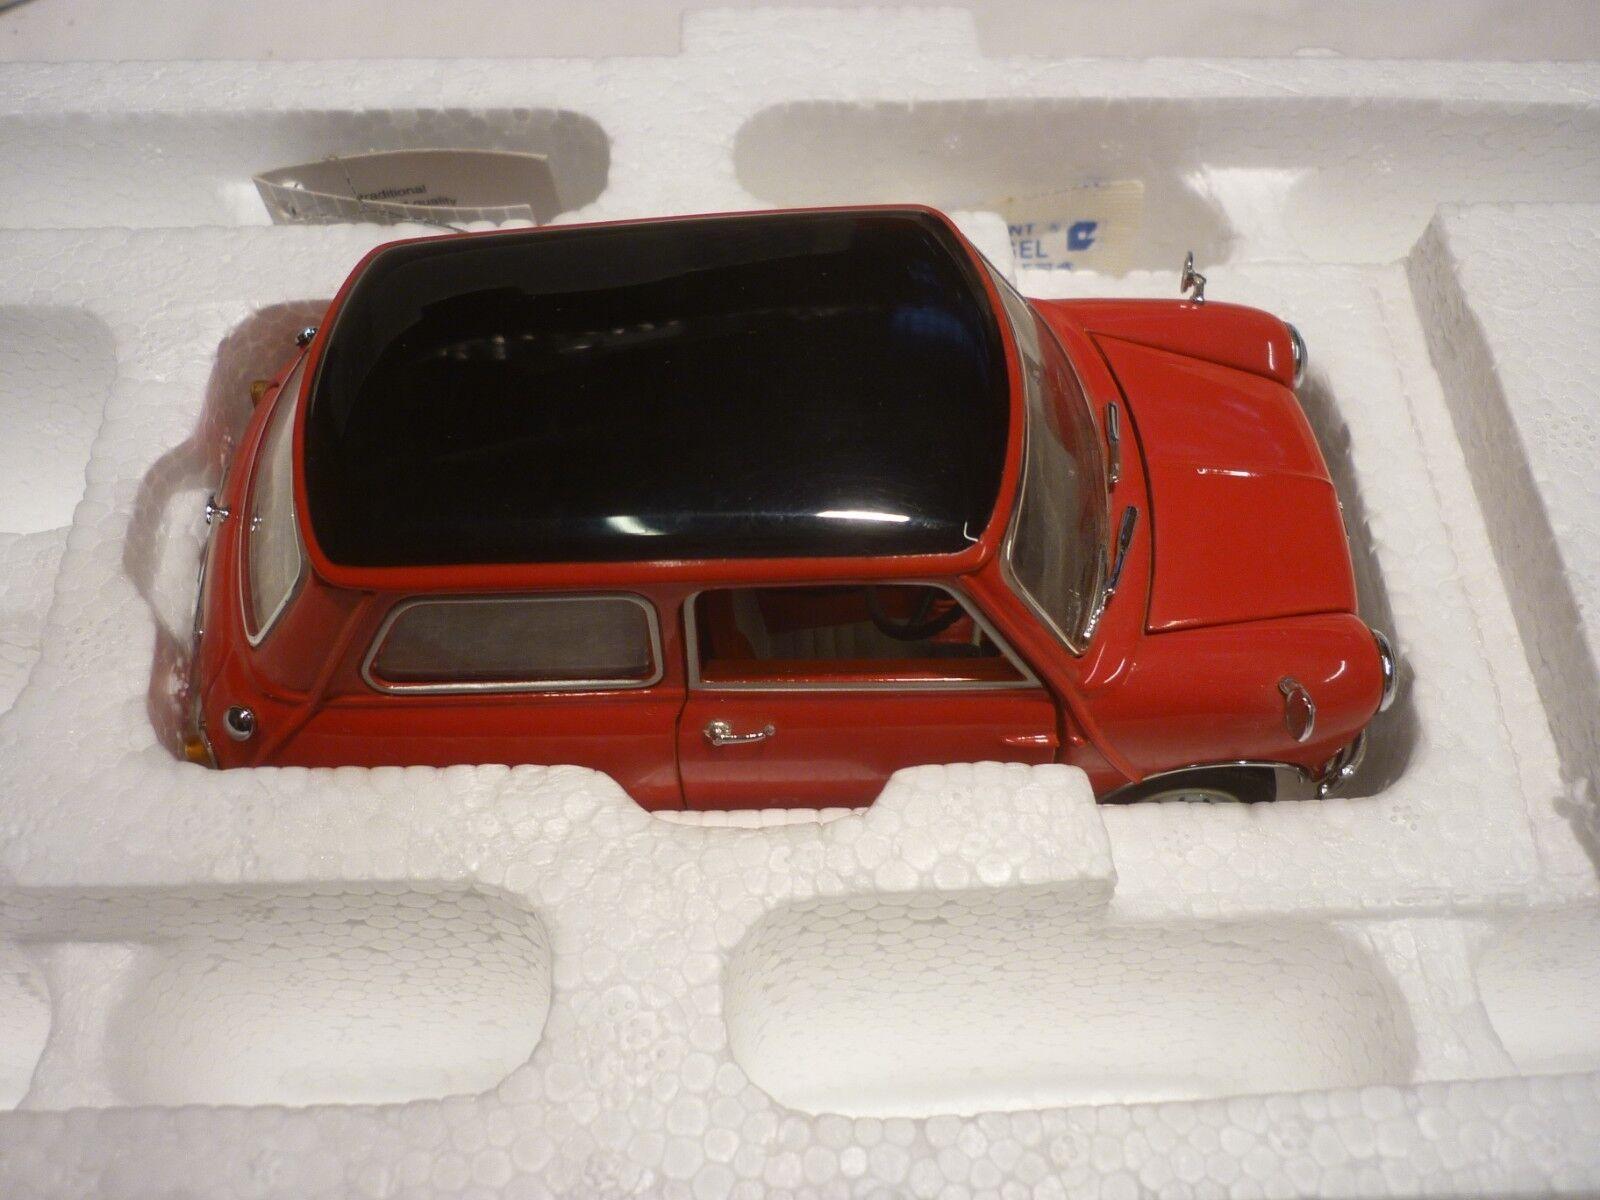 Un Franklin Comme neuf scale model voiture 1967 MORRIS MINI COOPER S, Boxed,